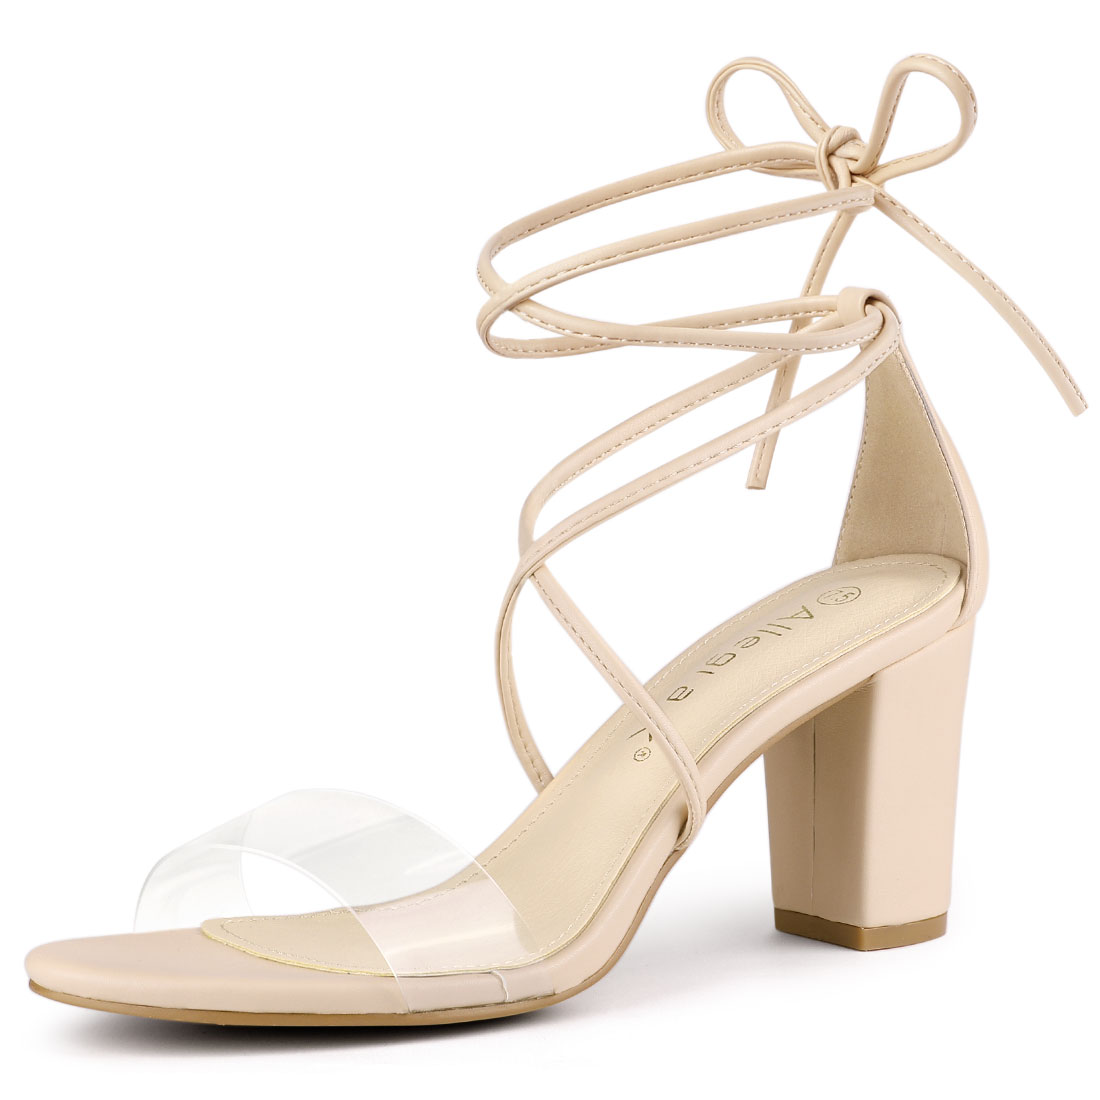 Allegra K Women's Clear Strap Block Heel Lace Up Heels Sandals Beige US 7